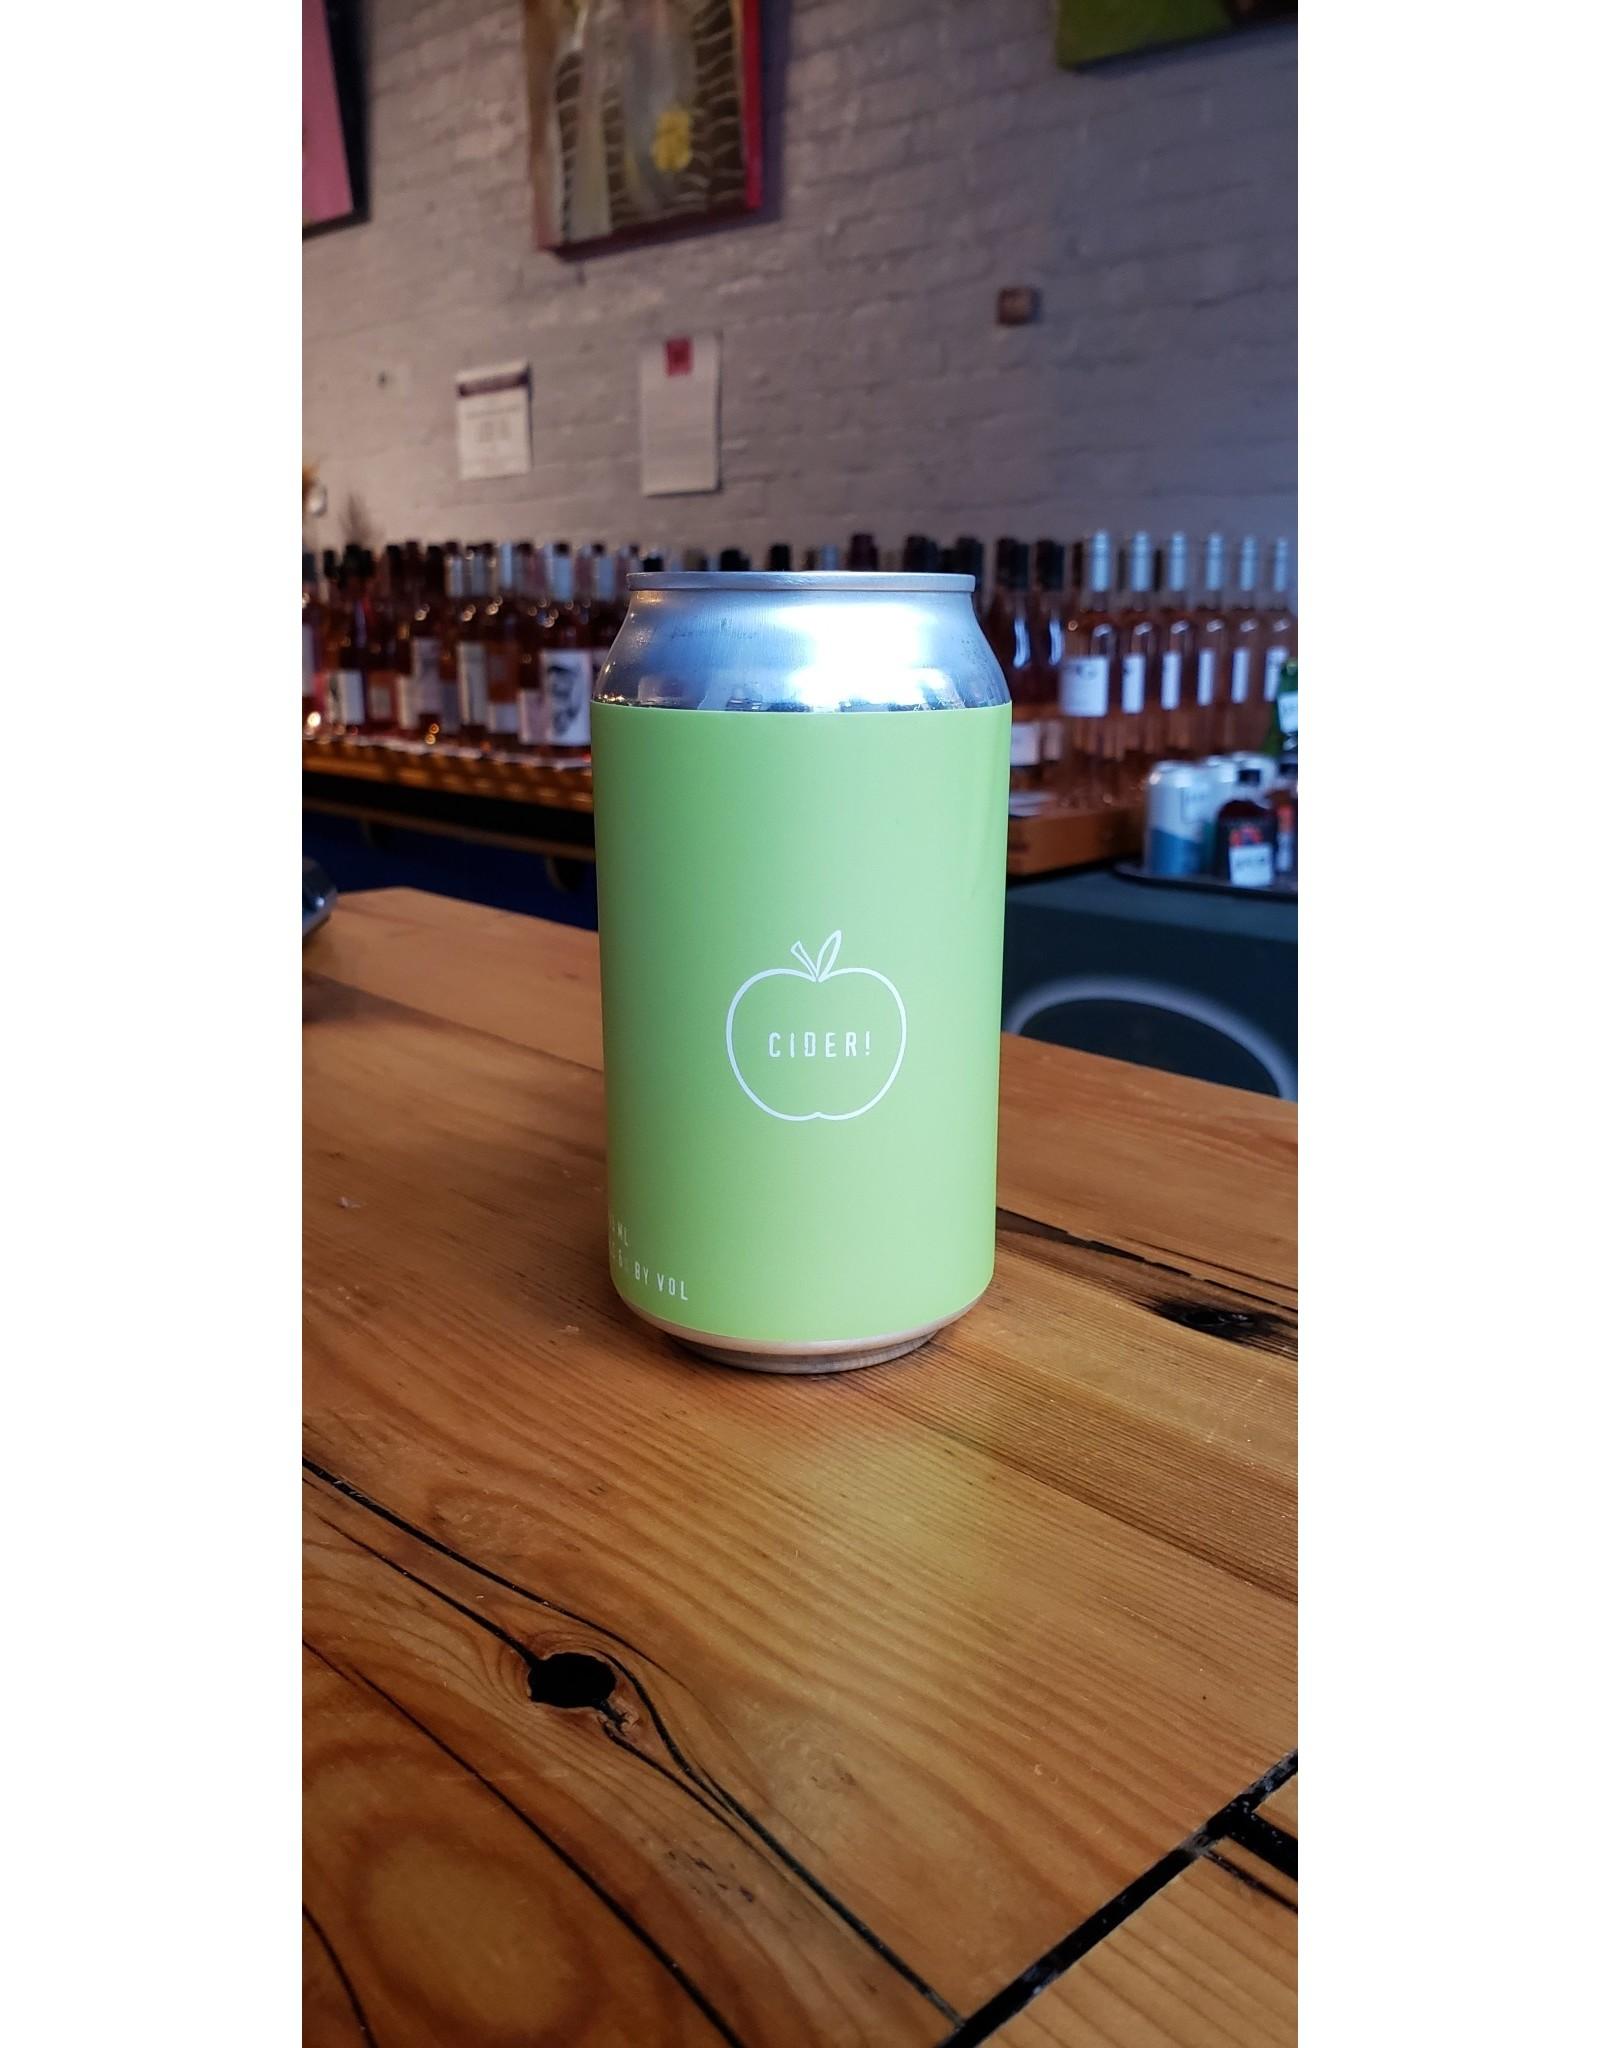 NY-Finger Lakes Wild Arc Farms Northern Spy Cider - Ontario County, NY (355ml can)